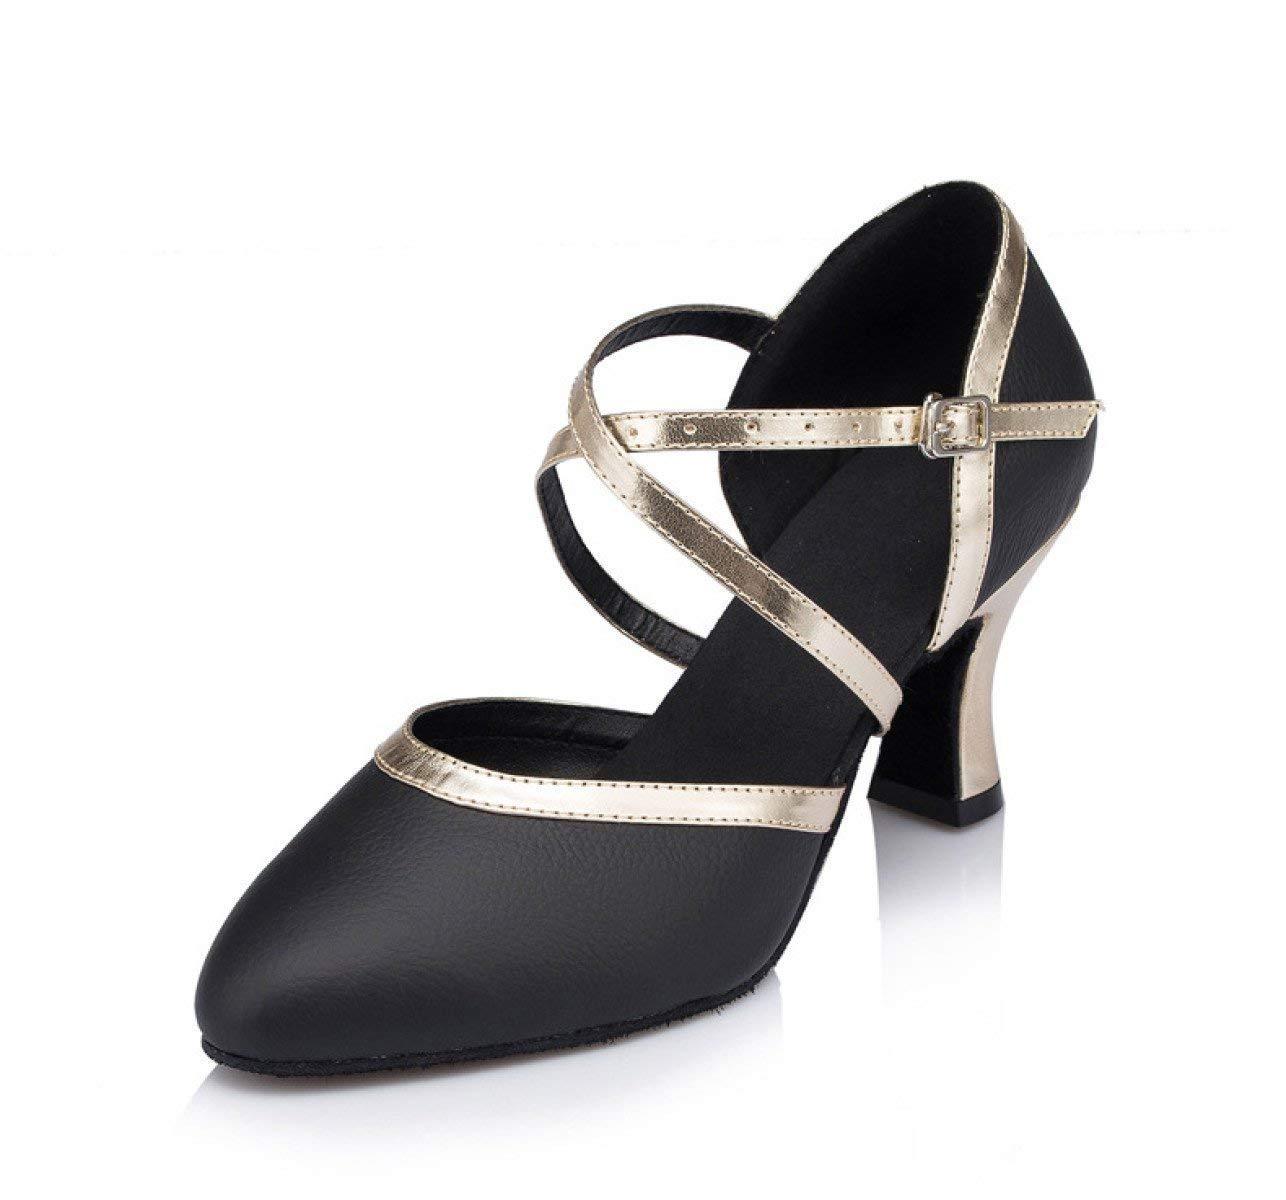 Damen Latin Dance Closed Toe High Heel UP Leder Glitter Salsa Tango Moderne Ballrom Mary Jance Tanzschuhe WeißHeeled6cm-UK5.5   EU38   Our39 (Farbe   schwarzheeled7cm Größe   UK5 EU37 Our38)